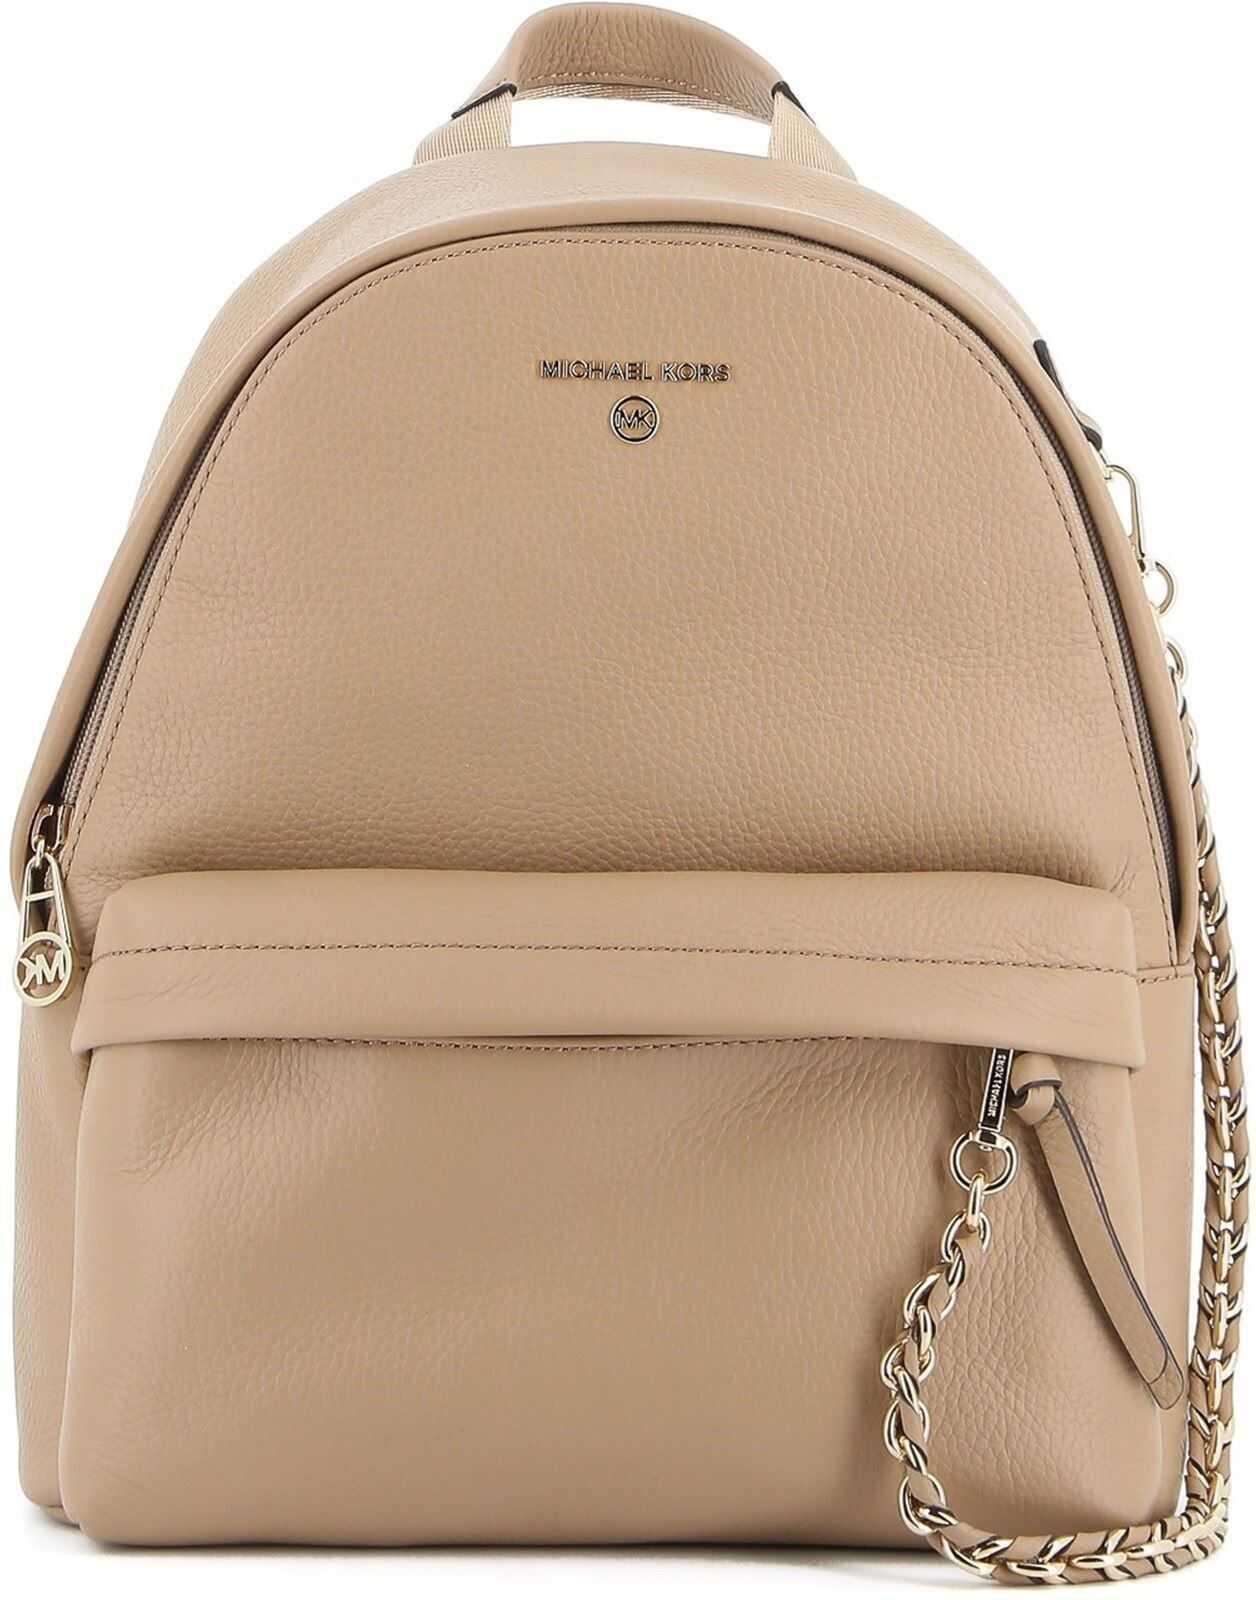 Michael Kors Slater Backpack In Camel Color 30T0L04B1L222 Beige imagine b-mall.ro